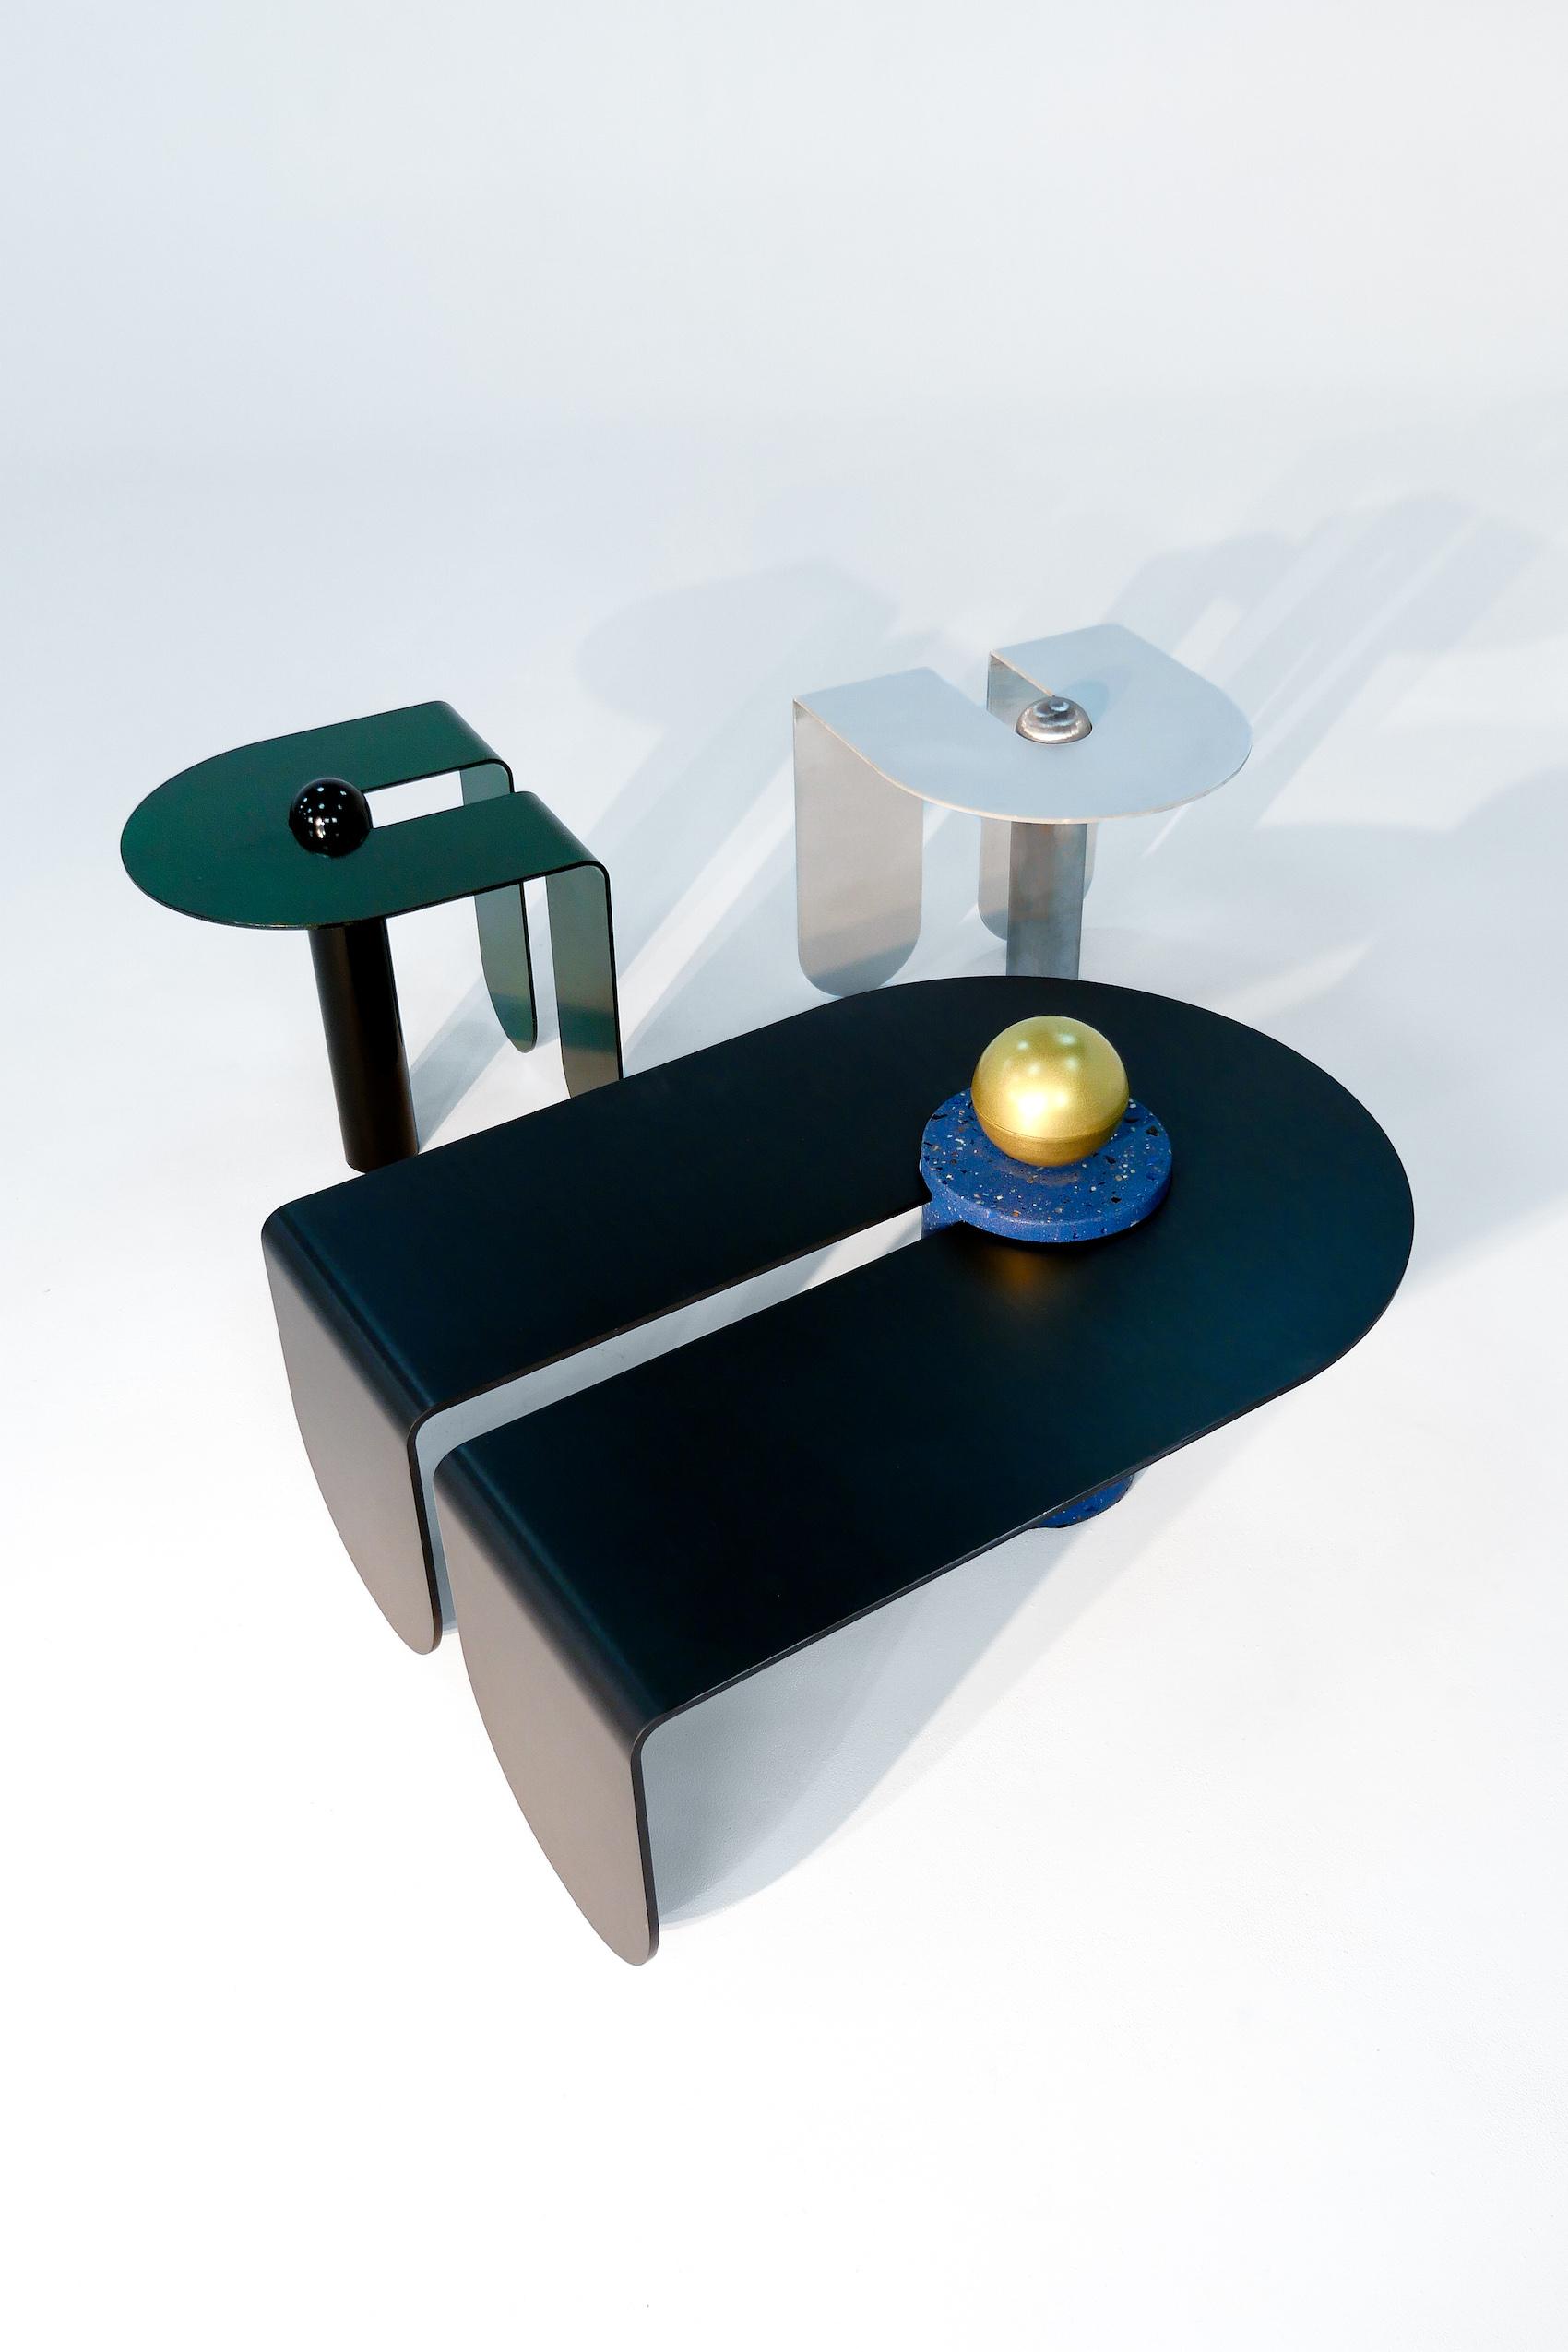 U&I Coffee Table by Birnam Wood Studio, Suna Bonometti